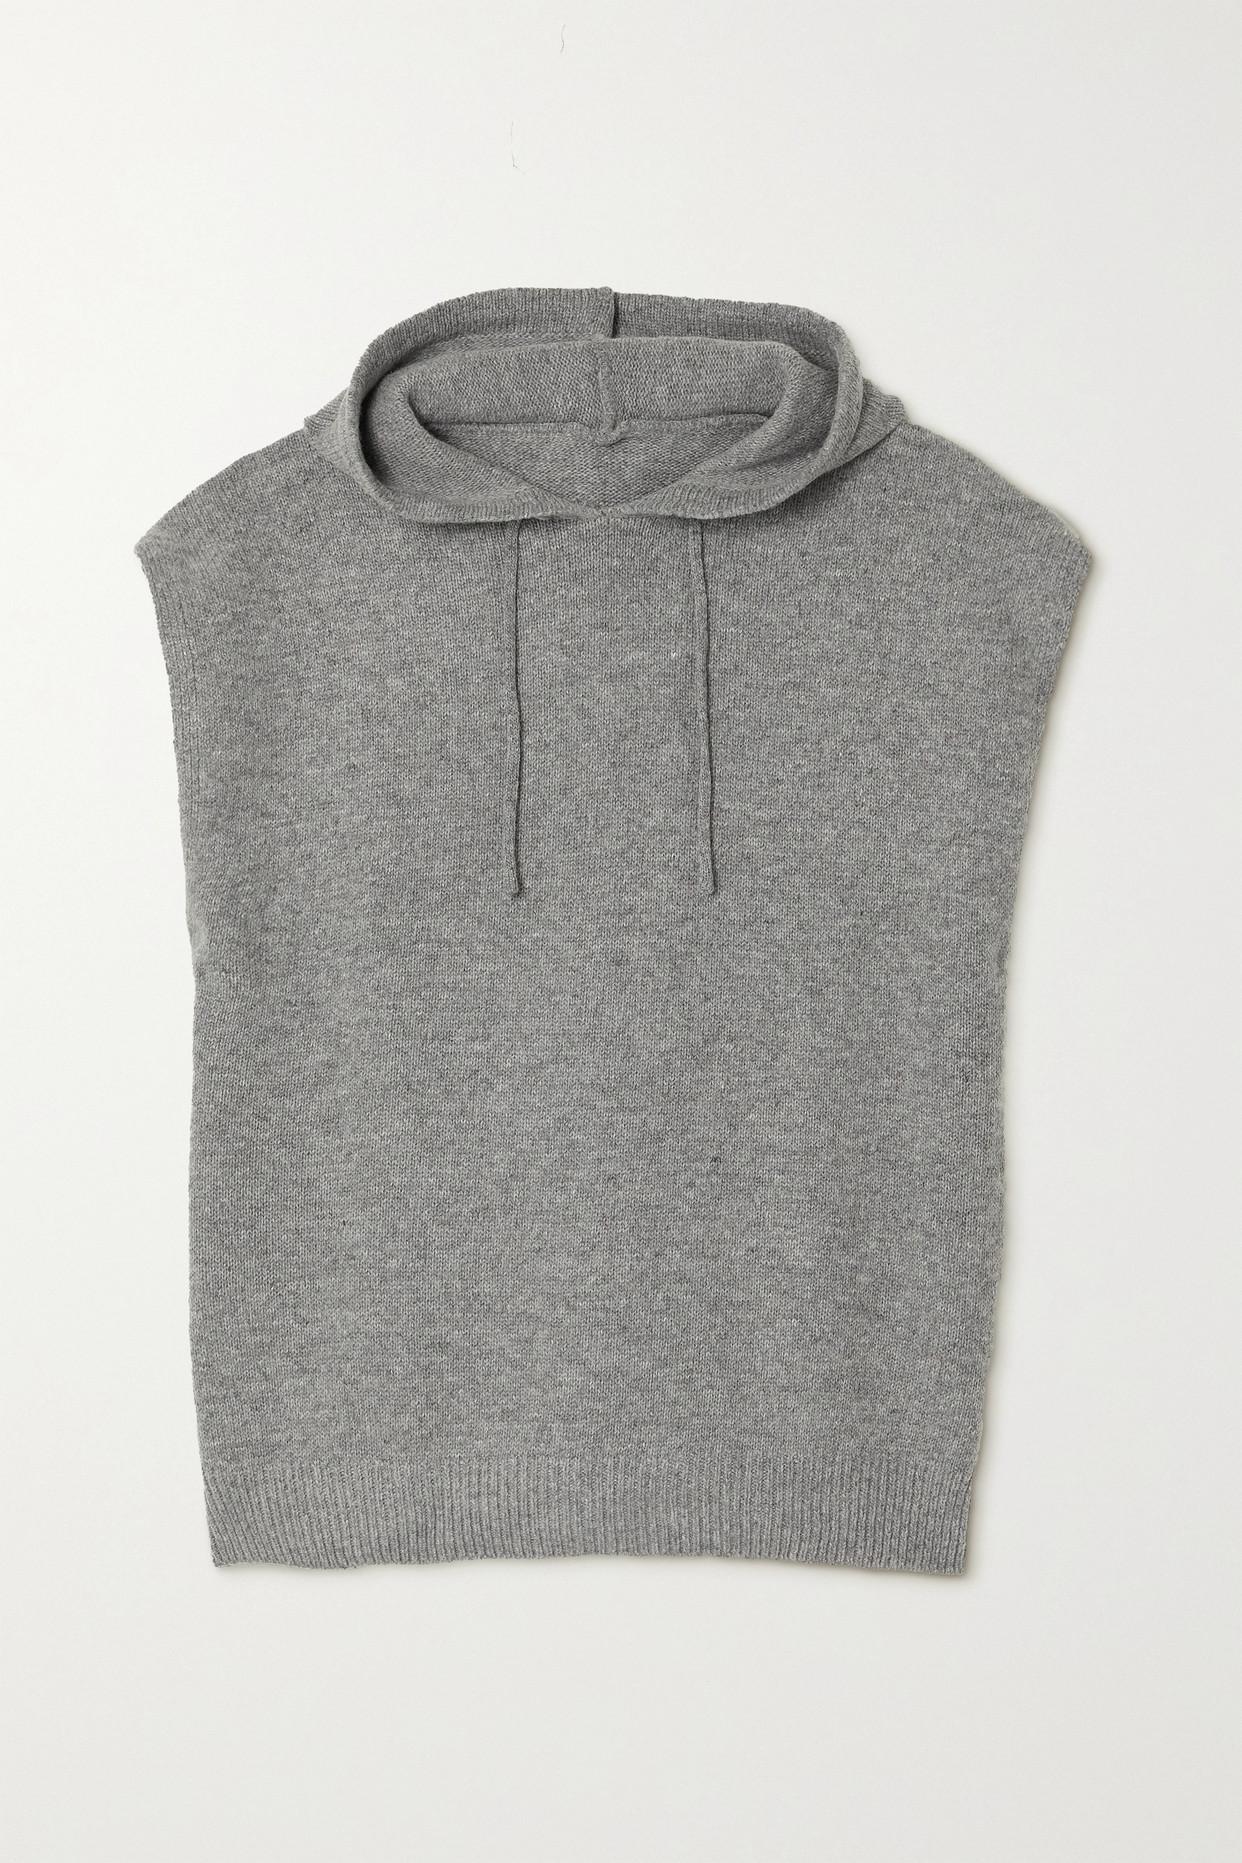 FRANKIE SHOP - Juno 羊毛混纺帽衫 - 灰色 - M/L